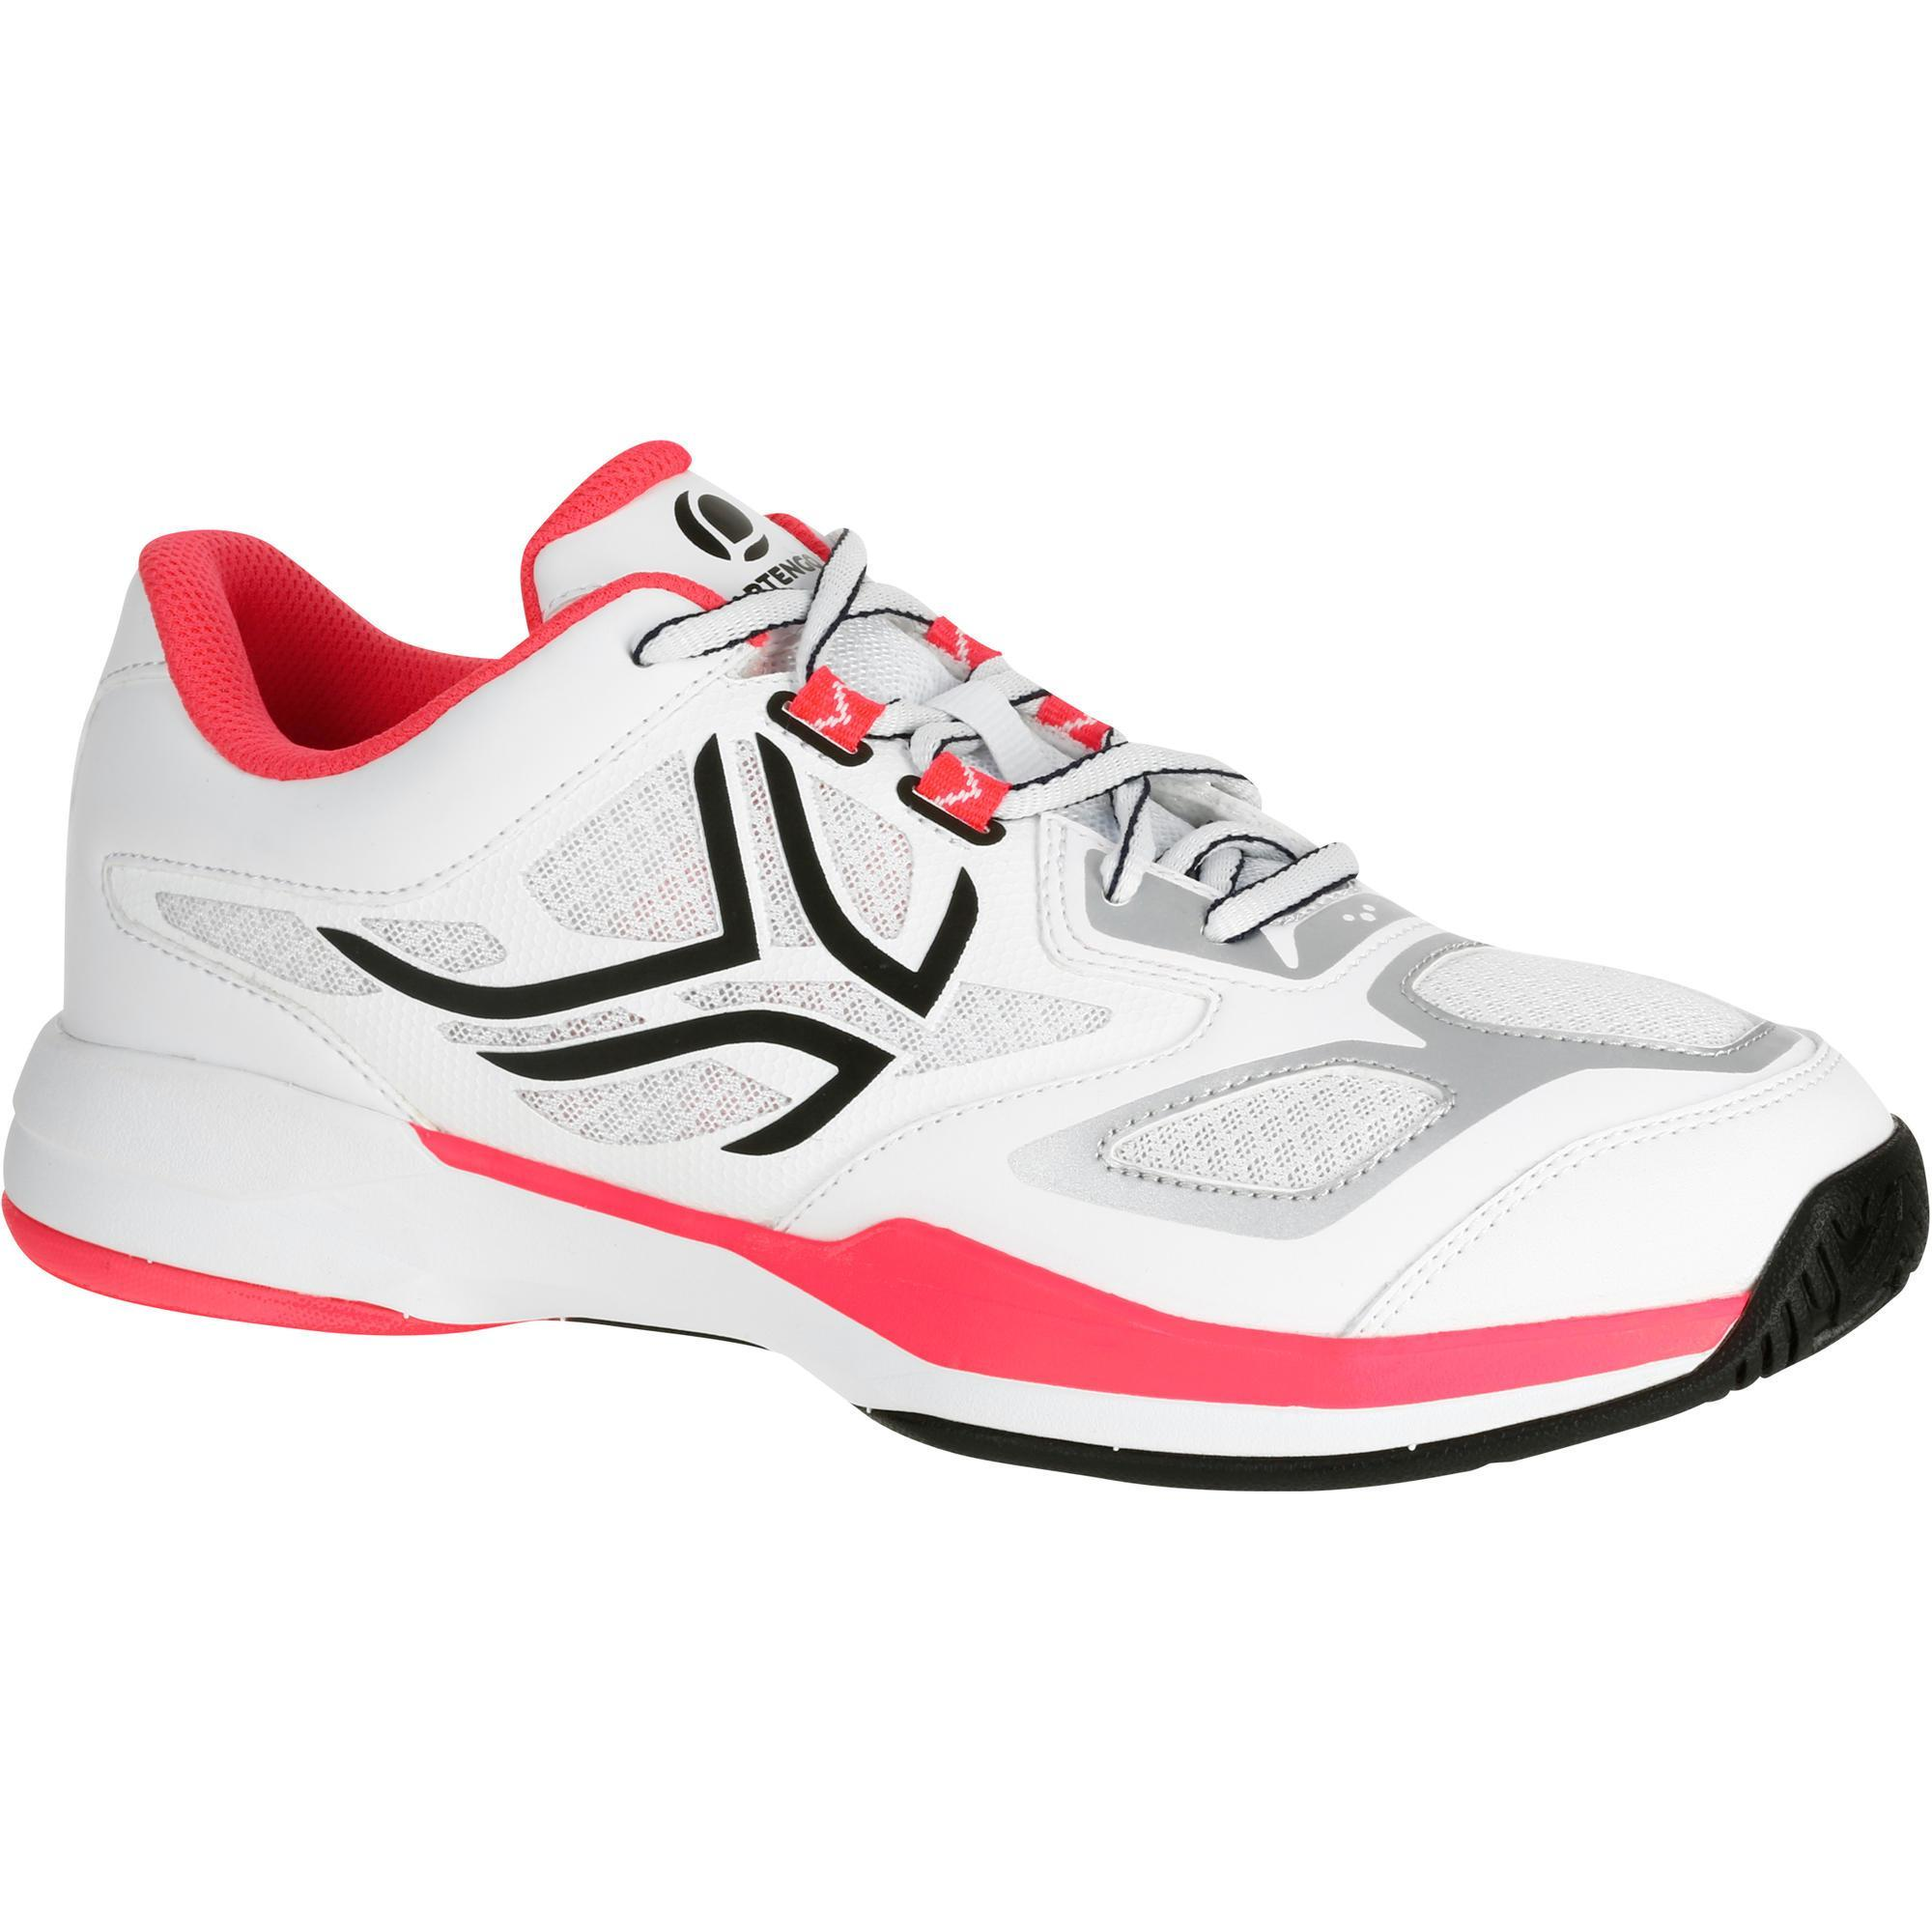 Artengo Tennisschoenen dames TS560